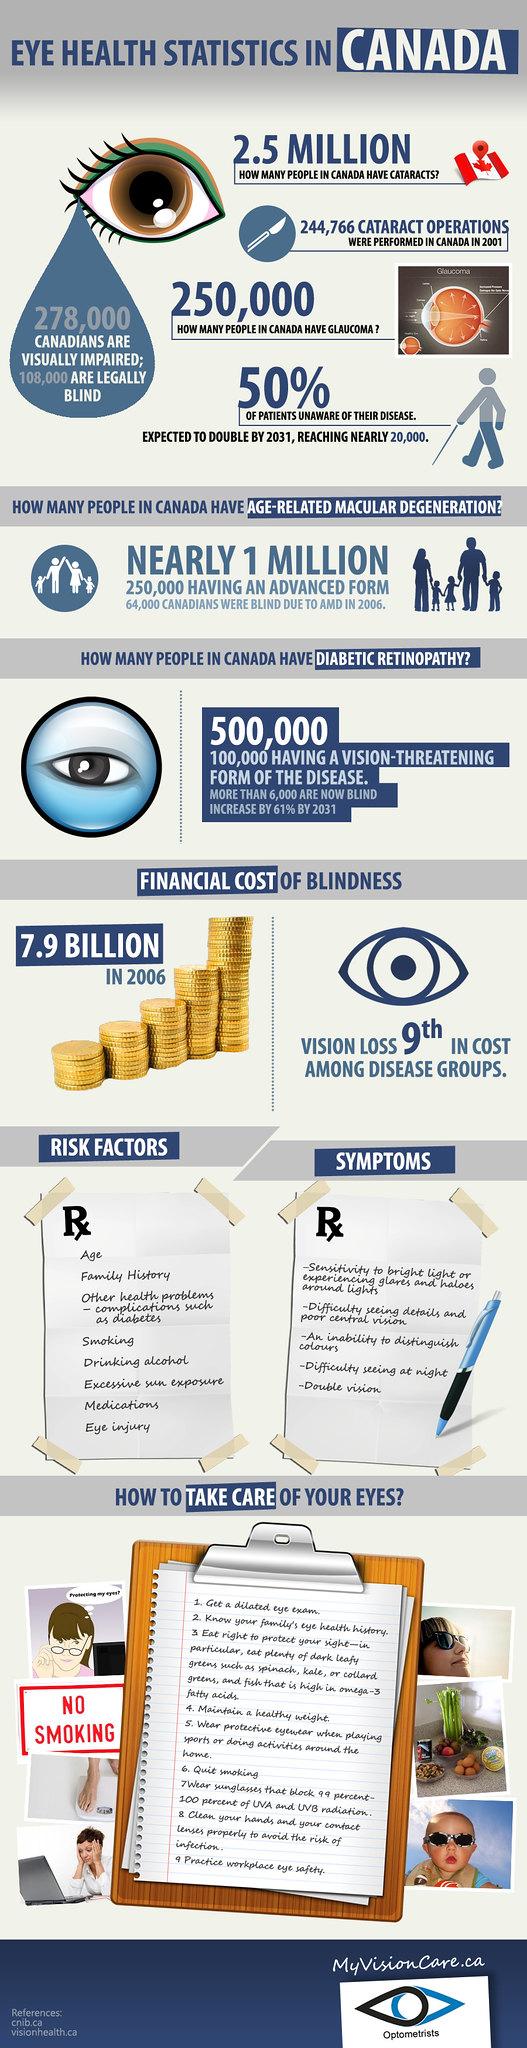 Eye Health Statistics